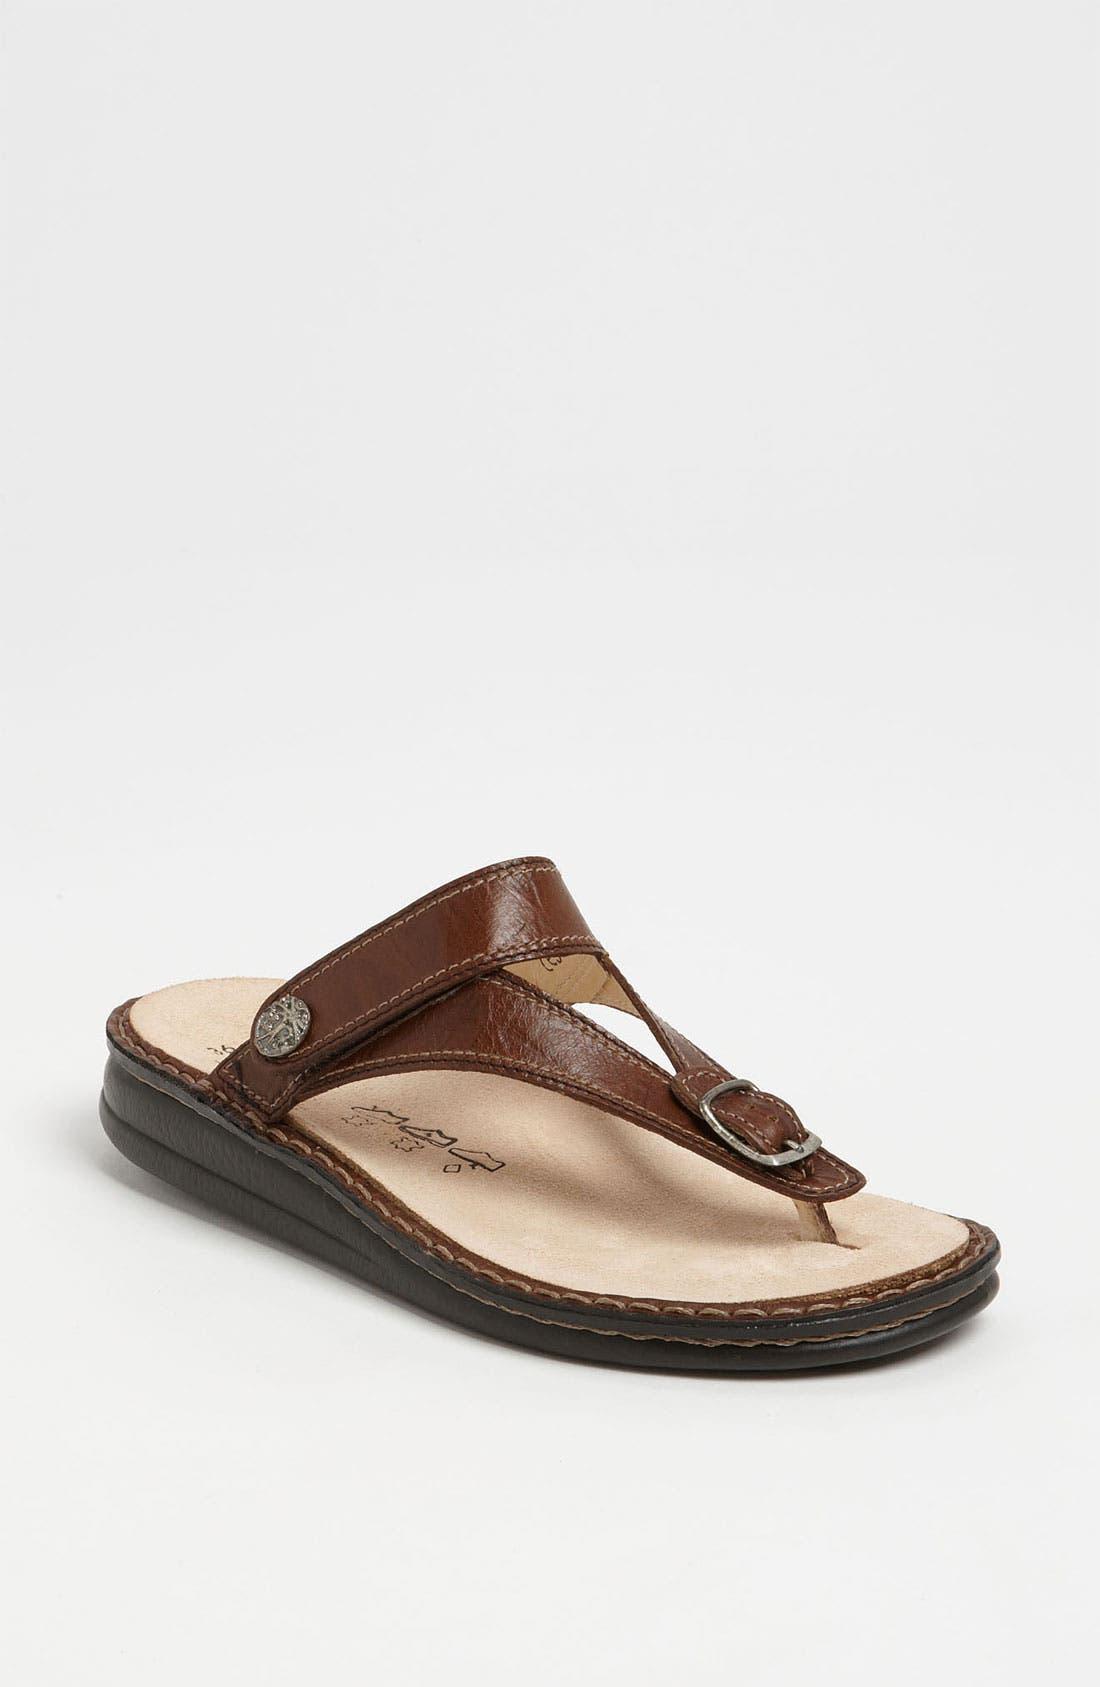 Main Image - Finn Comfort 'Alexandria' Thong Sandal